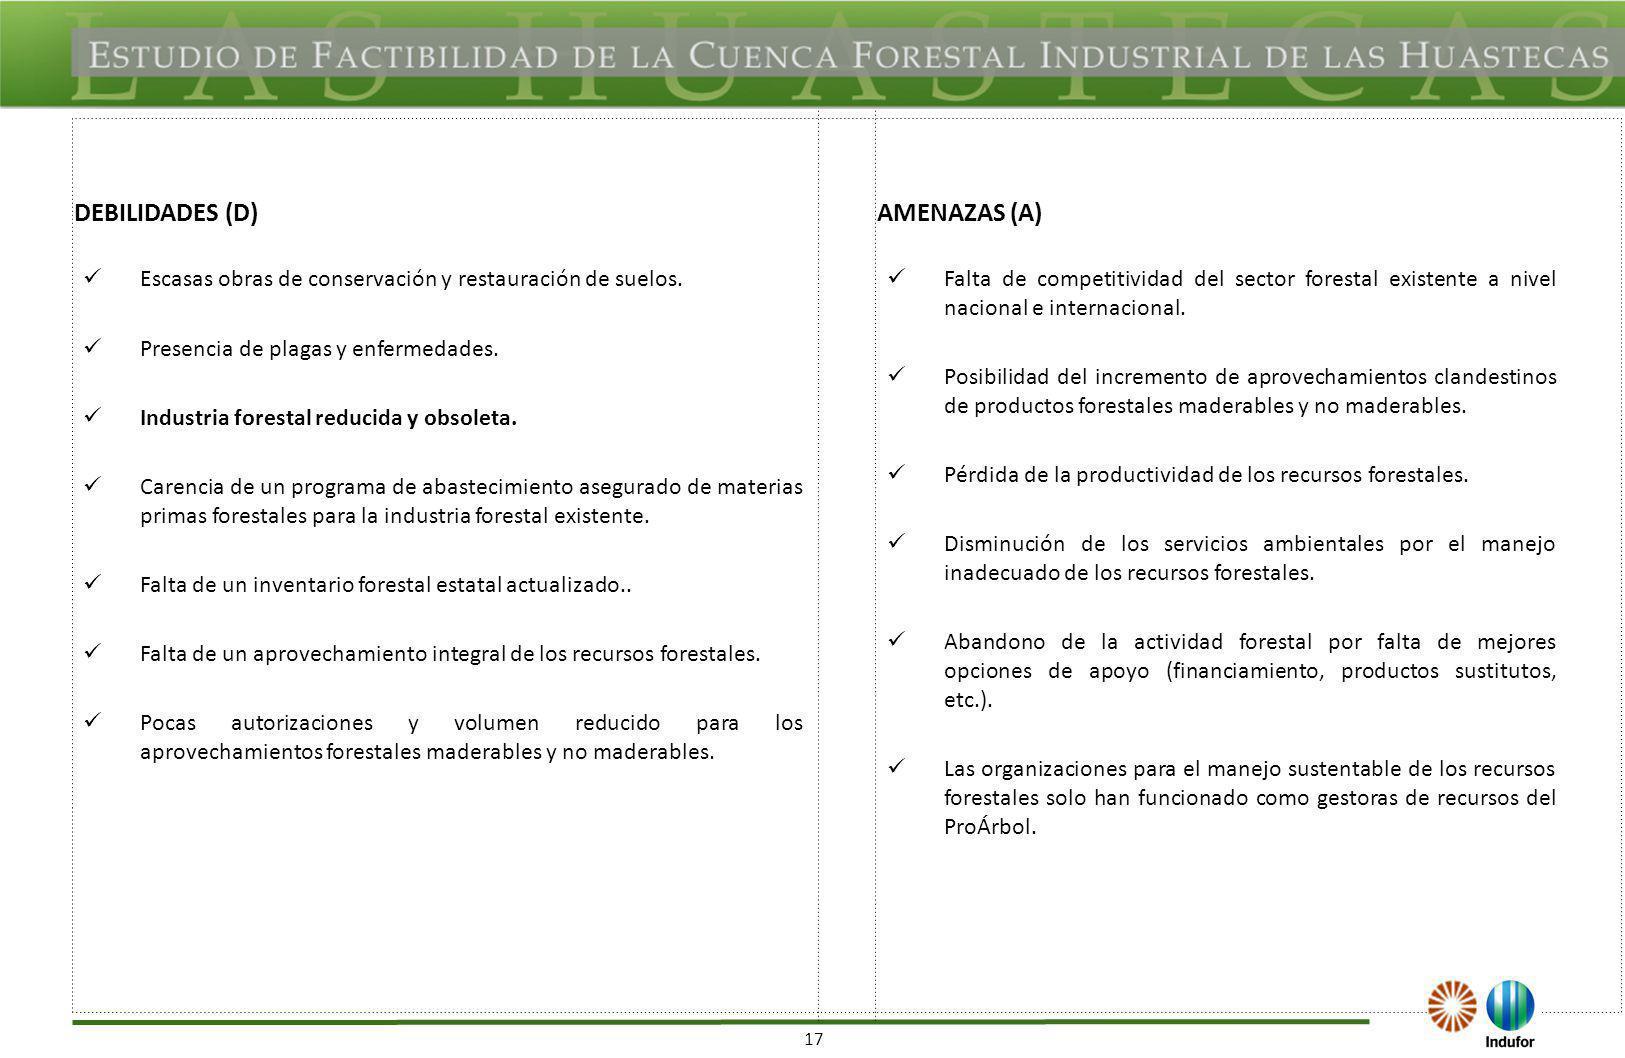 TAMAULIPAS FORTALEZAS (F) OPORTUNIDADES (O)